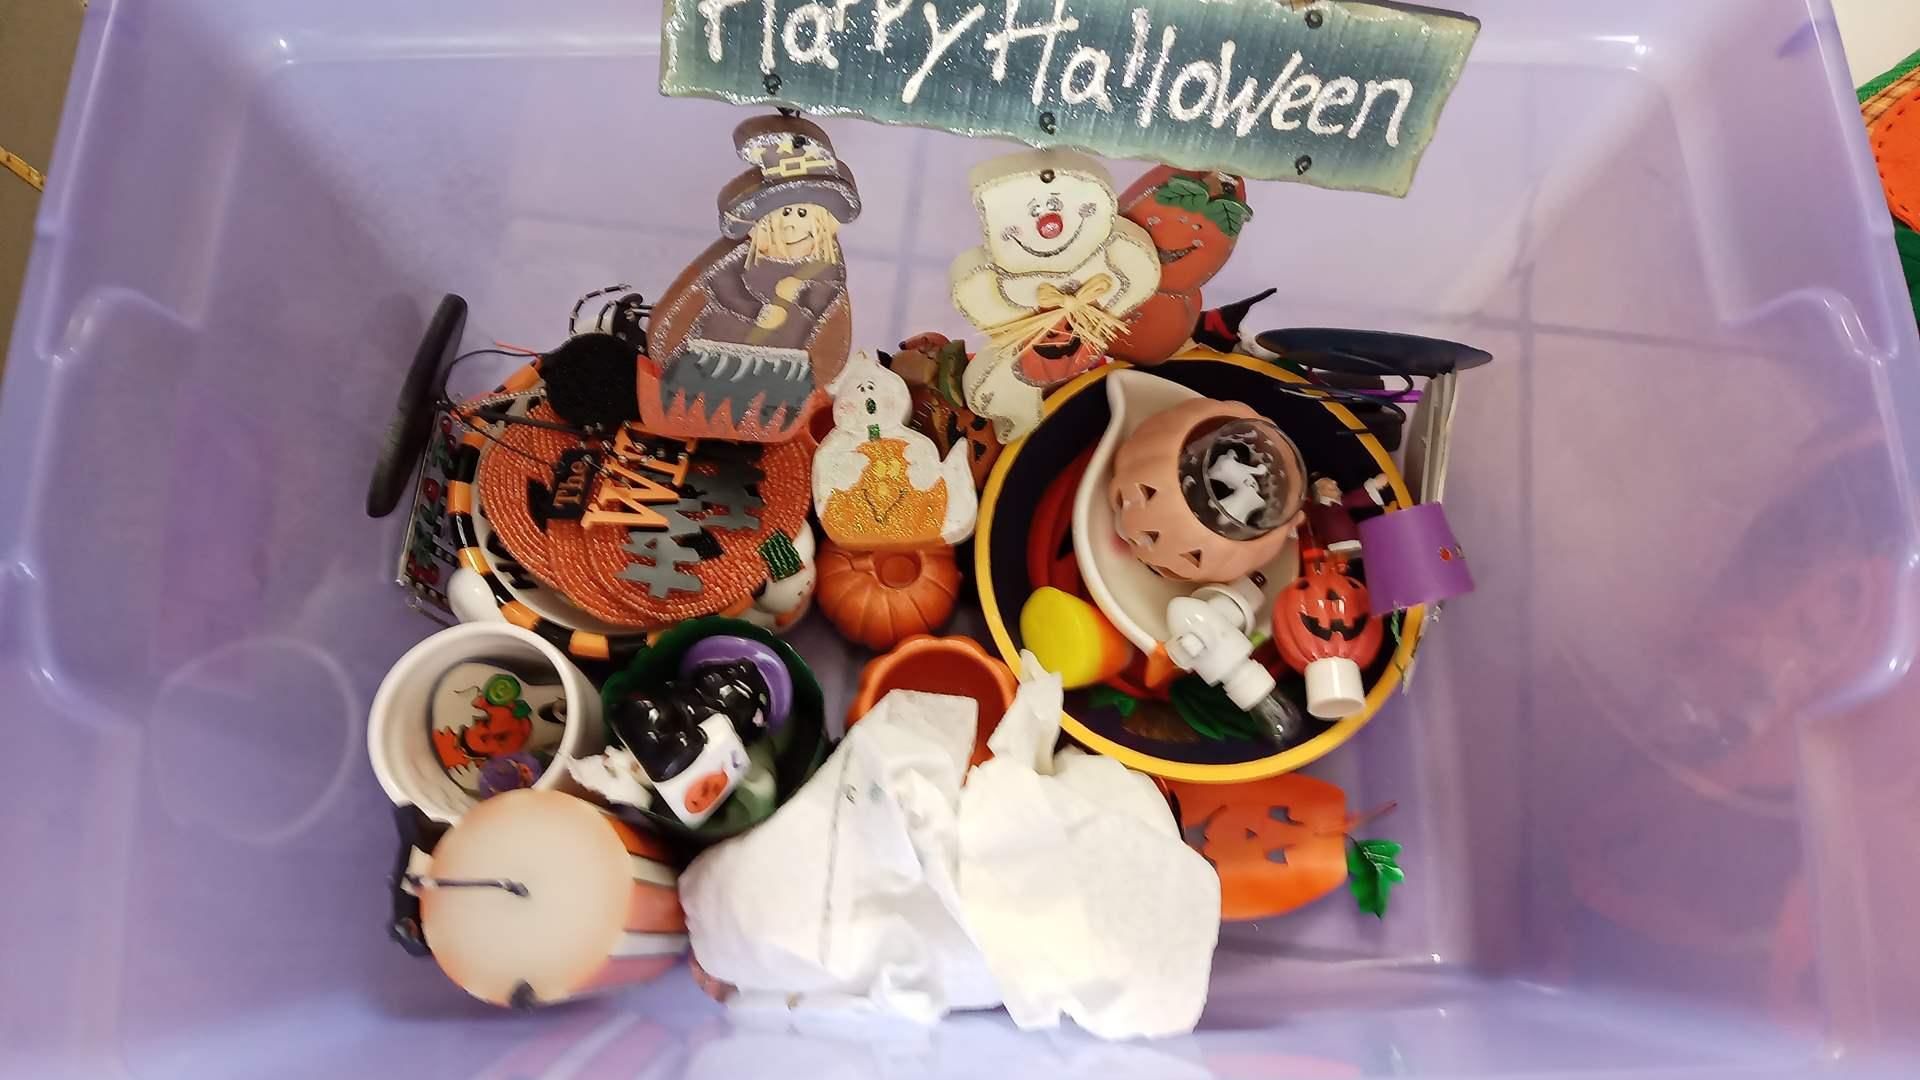 Lot # 96 Halloween Decorations: Paper Supplies, Floor Mat, Blanket, Fake Jackolantern, and more